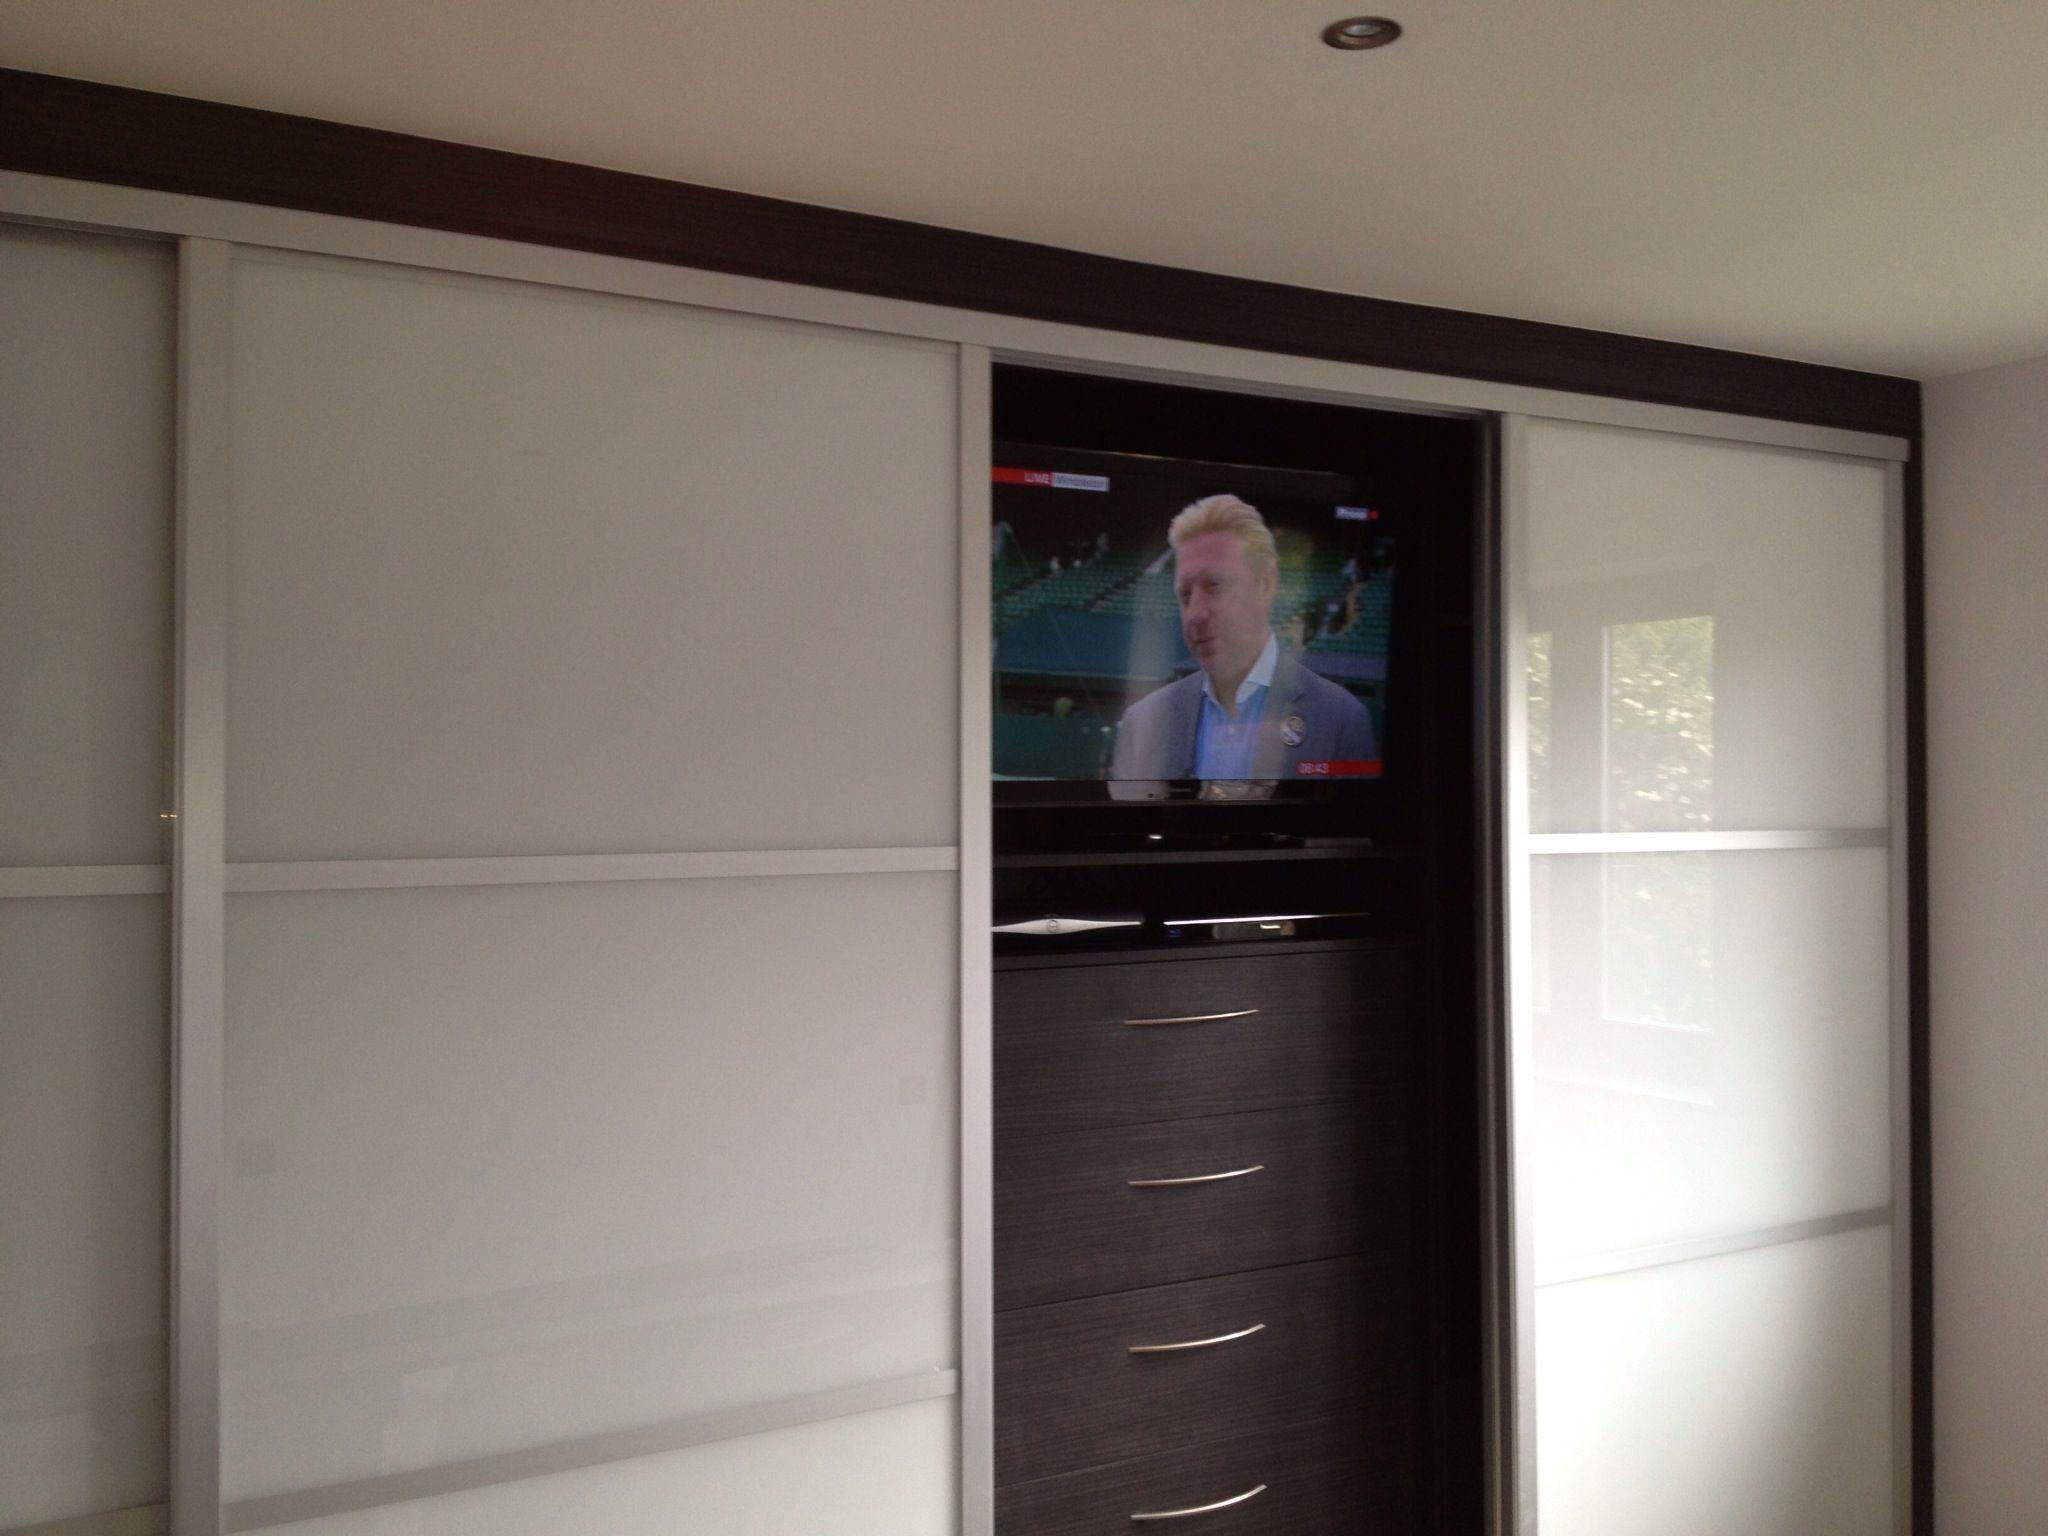 New doors for fitted wardrobes - Resultado De Imagen De Fitted Wardrobes With Built In Tv